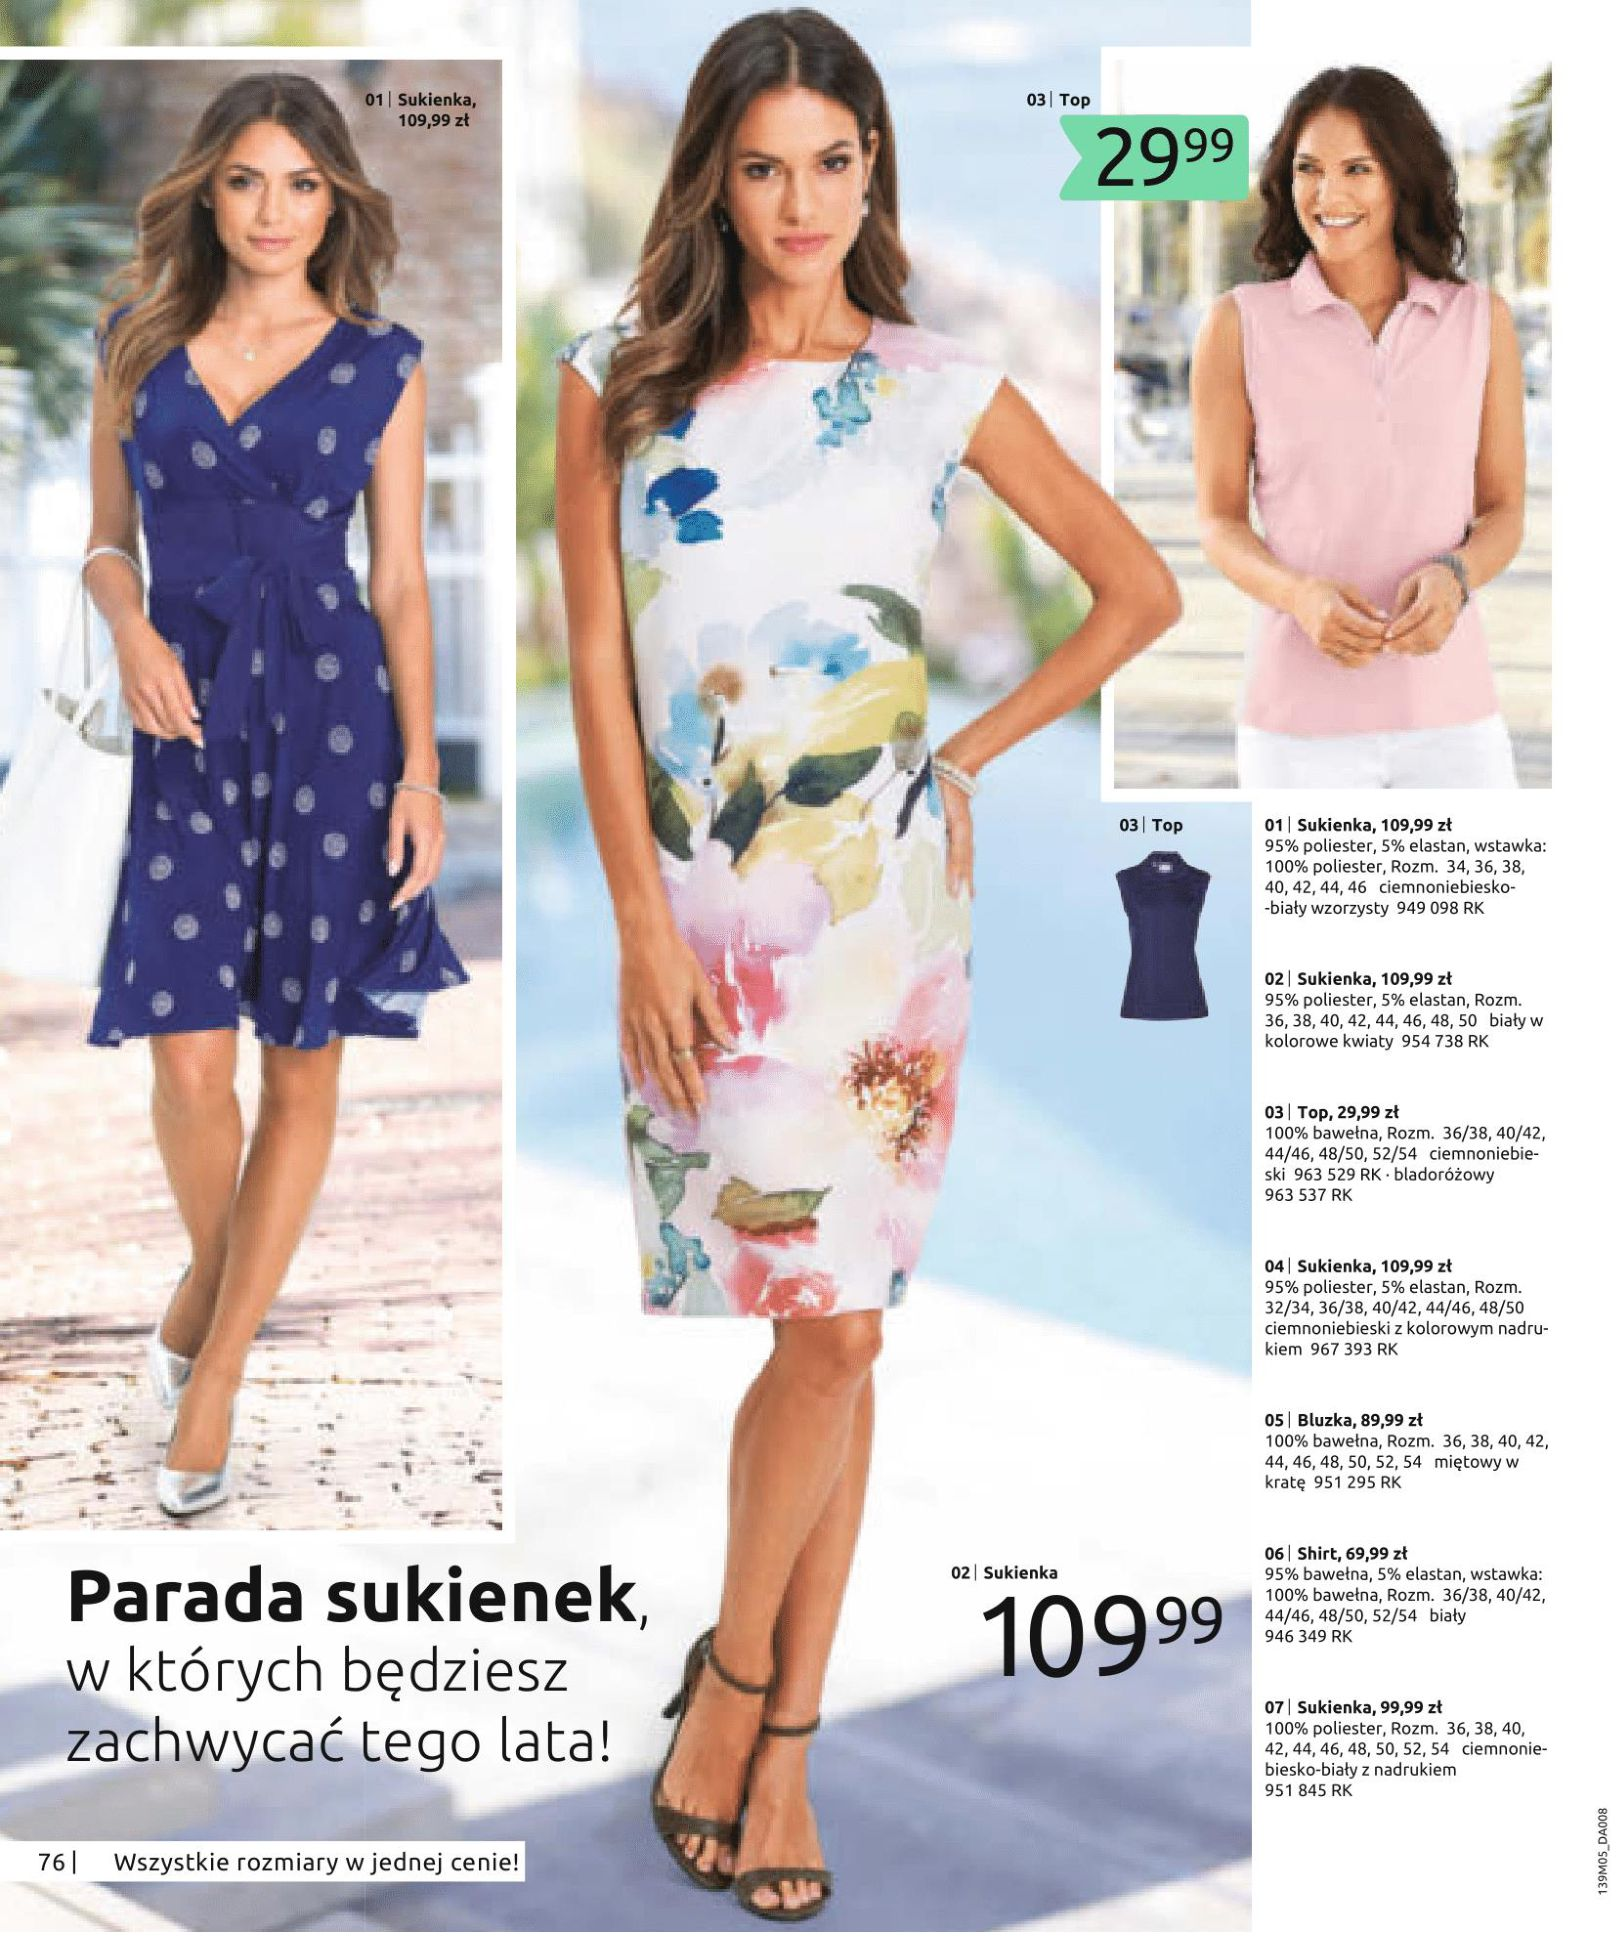 Gazetka Bonprix - Romantic Summer-02.07.2019-29.10.2019-page-78